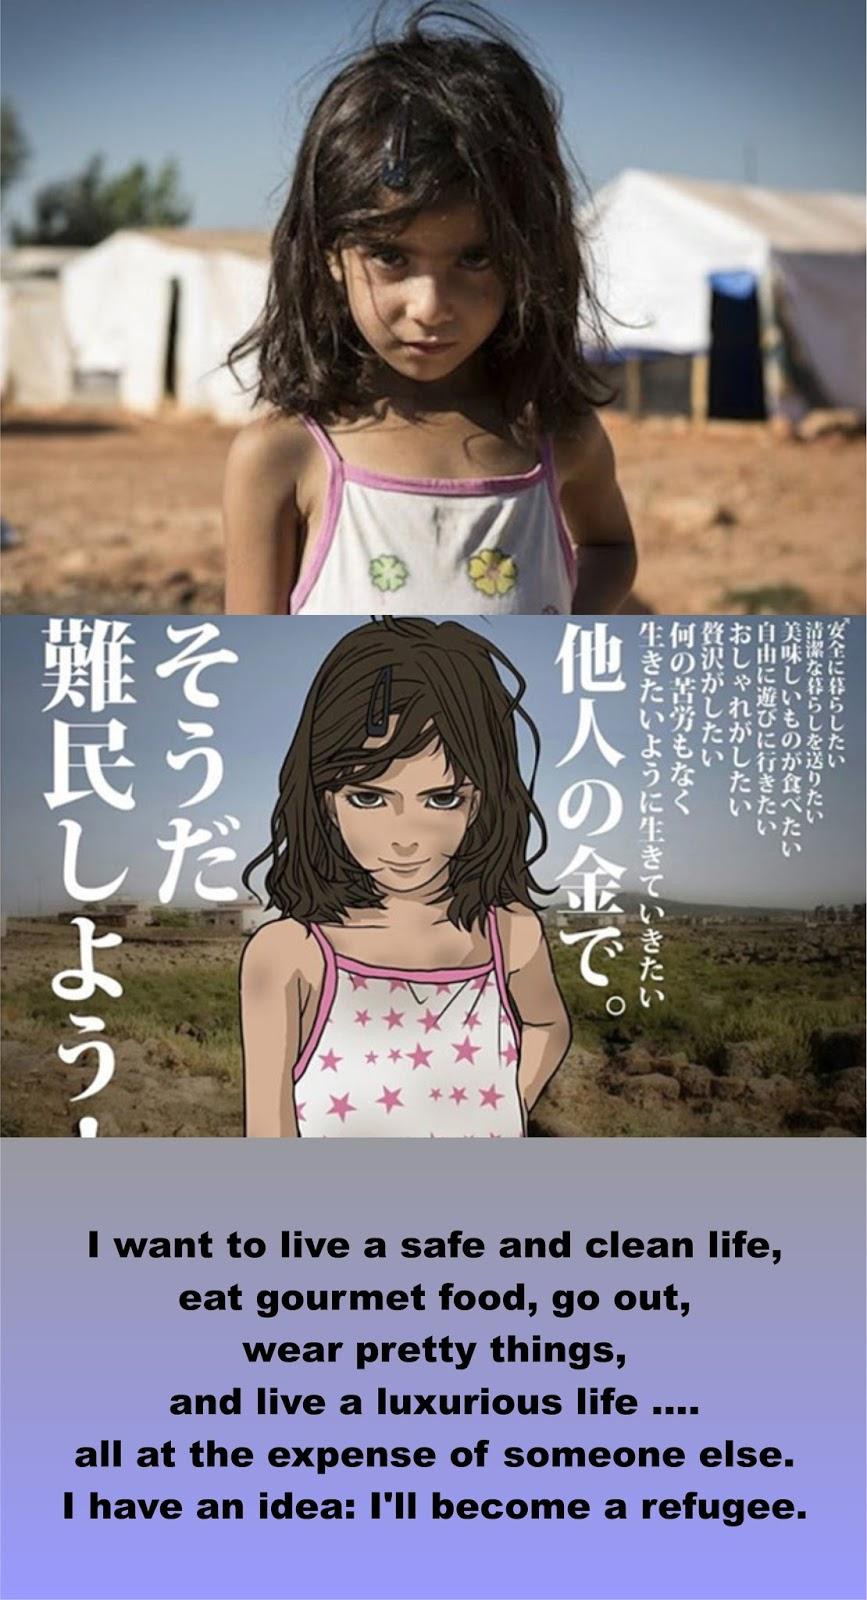 http://www.theguardian.com/world/2015/nov/15/manga-rows-japan-g7-shima-syria-protest?CMP=twt_gu